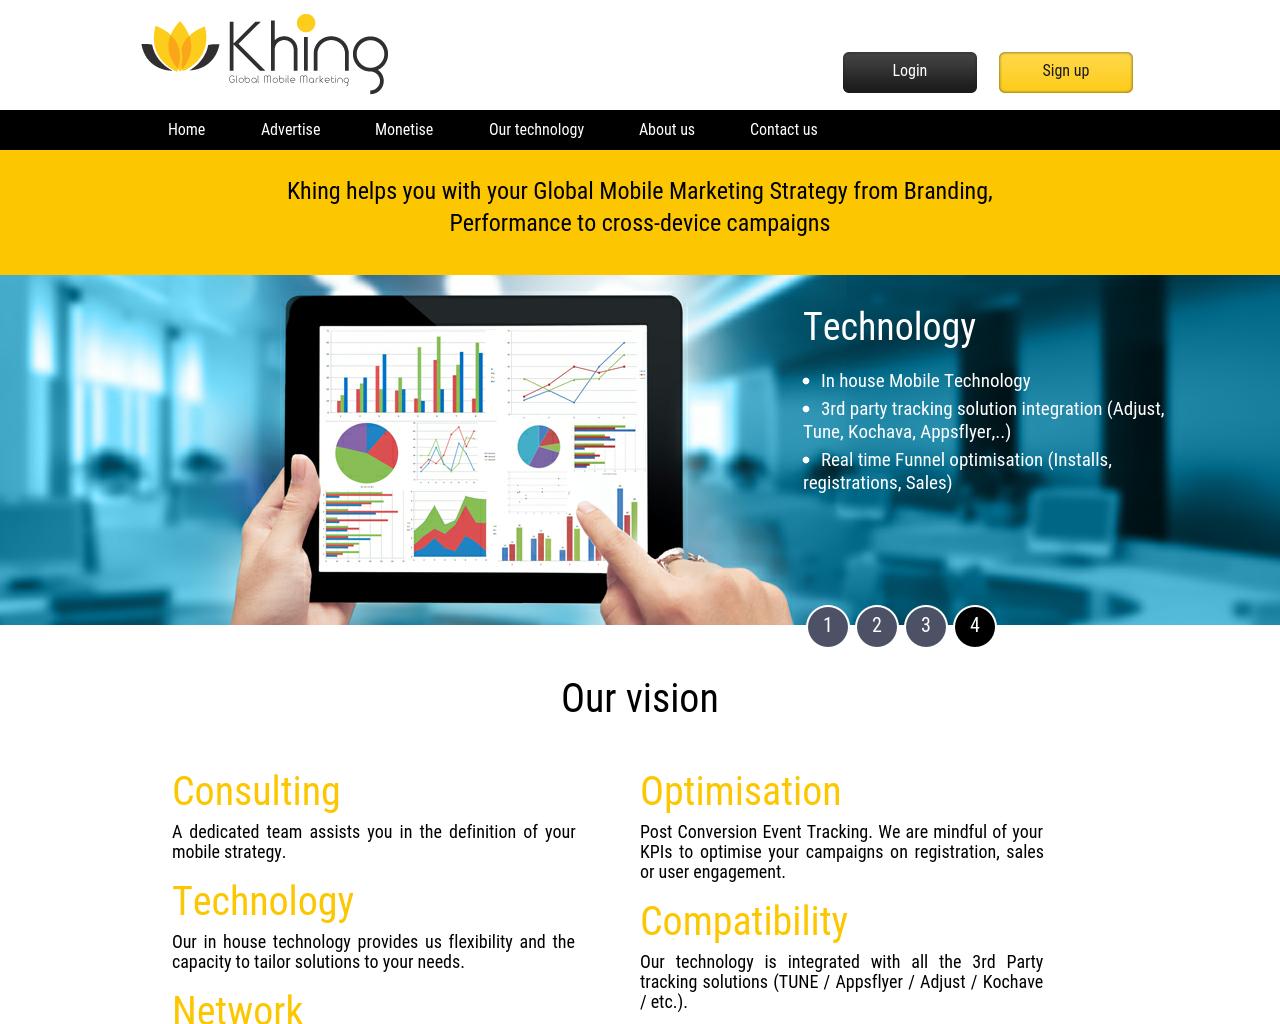 Khing-Advertising-Reviews-Pricing